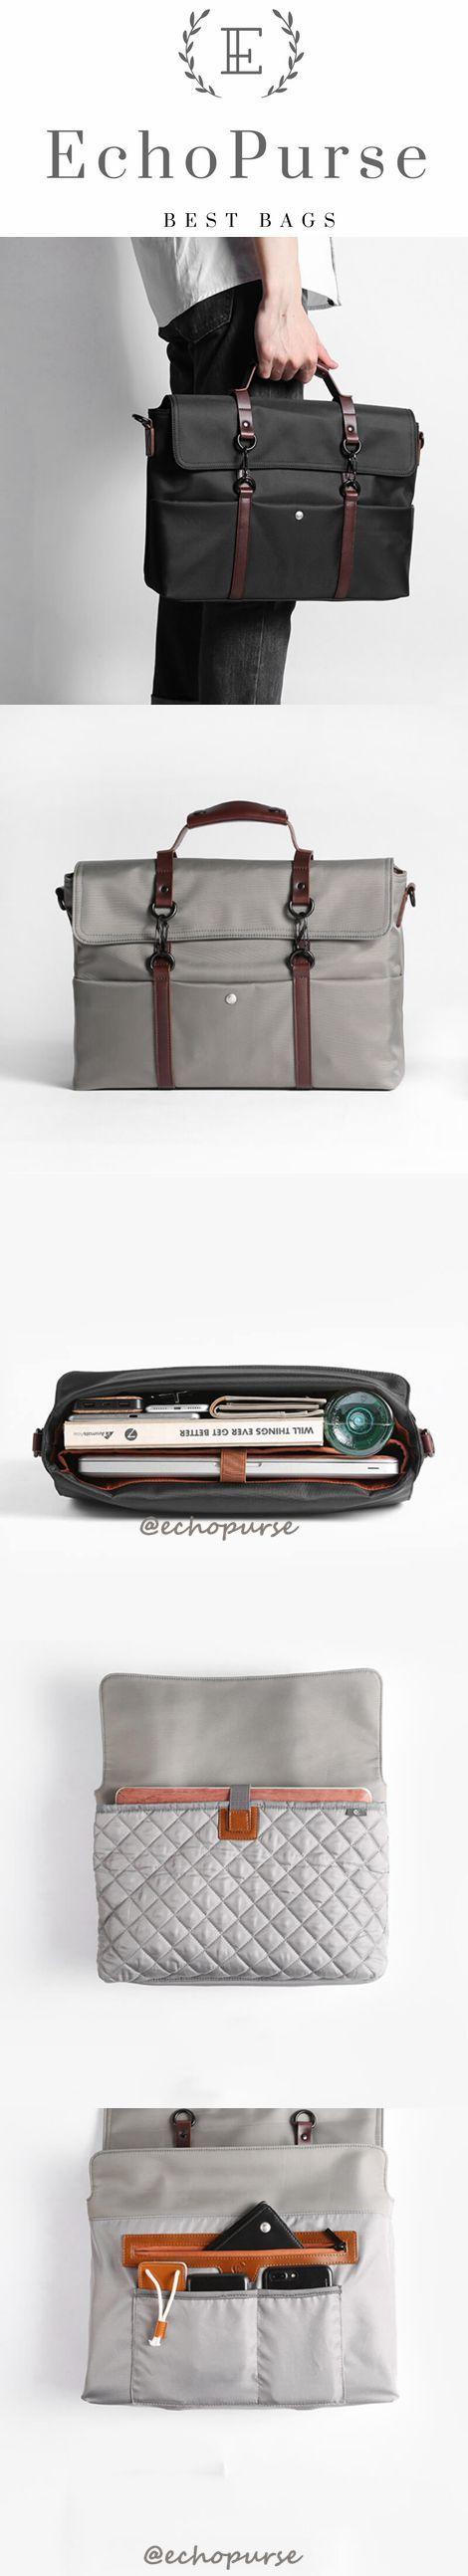 New Arrival Men's Handbag, Business Briefcase, Waterproof Laptop Bag 103